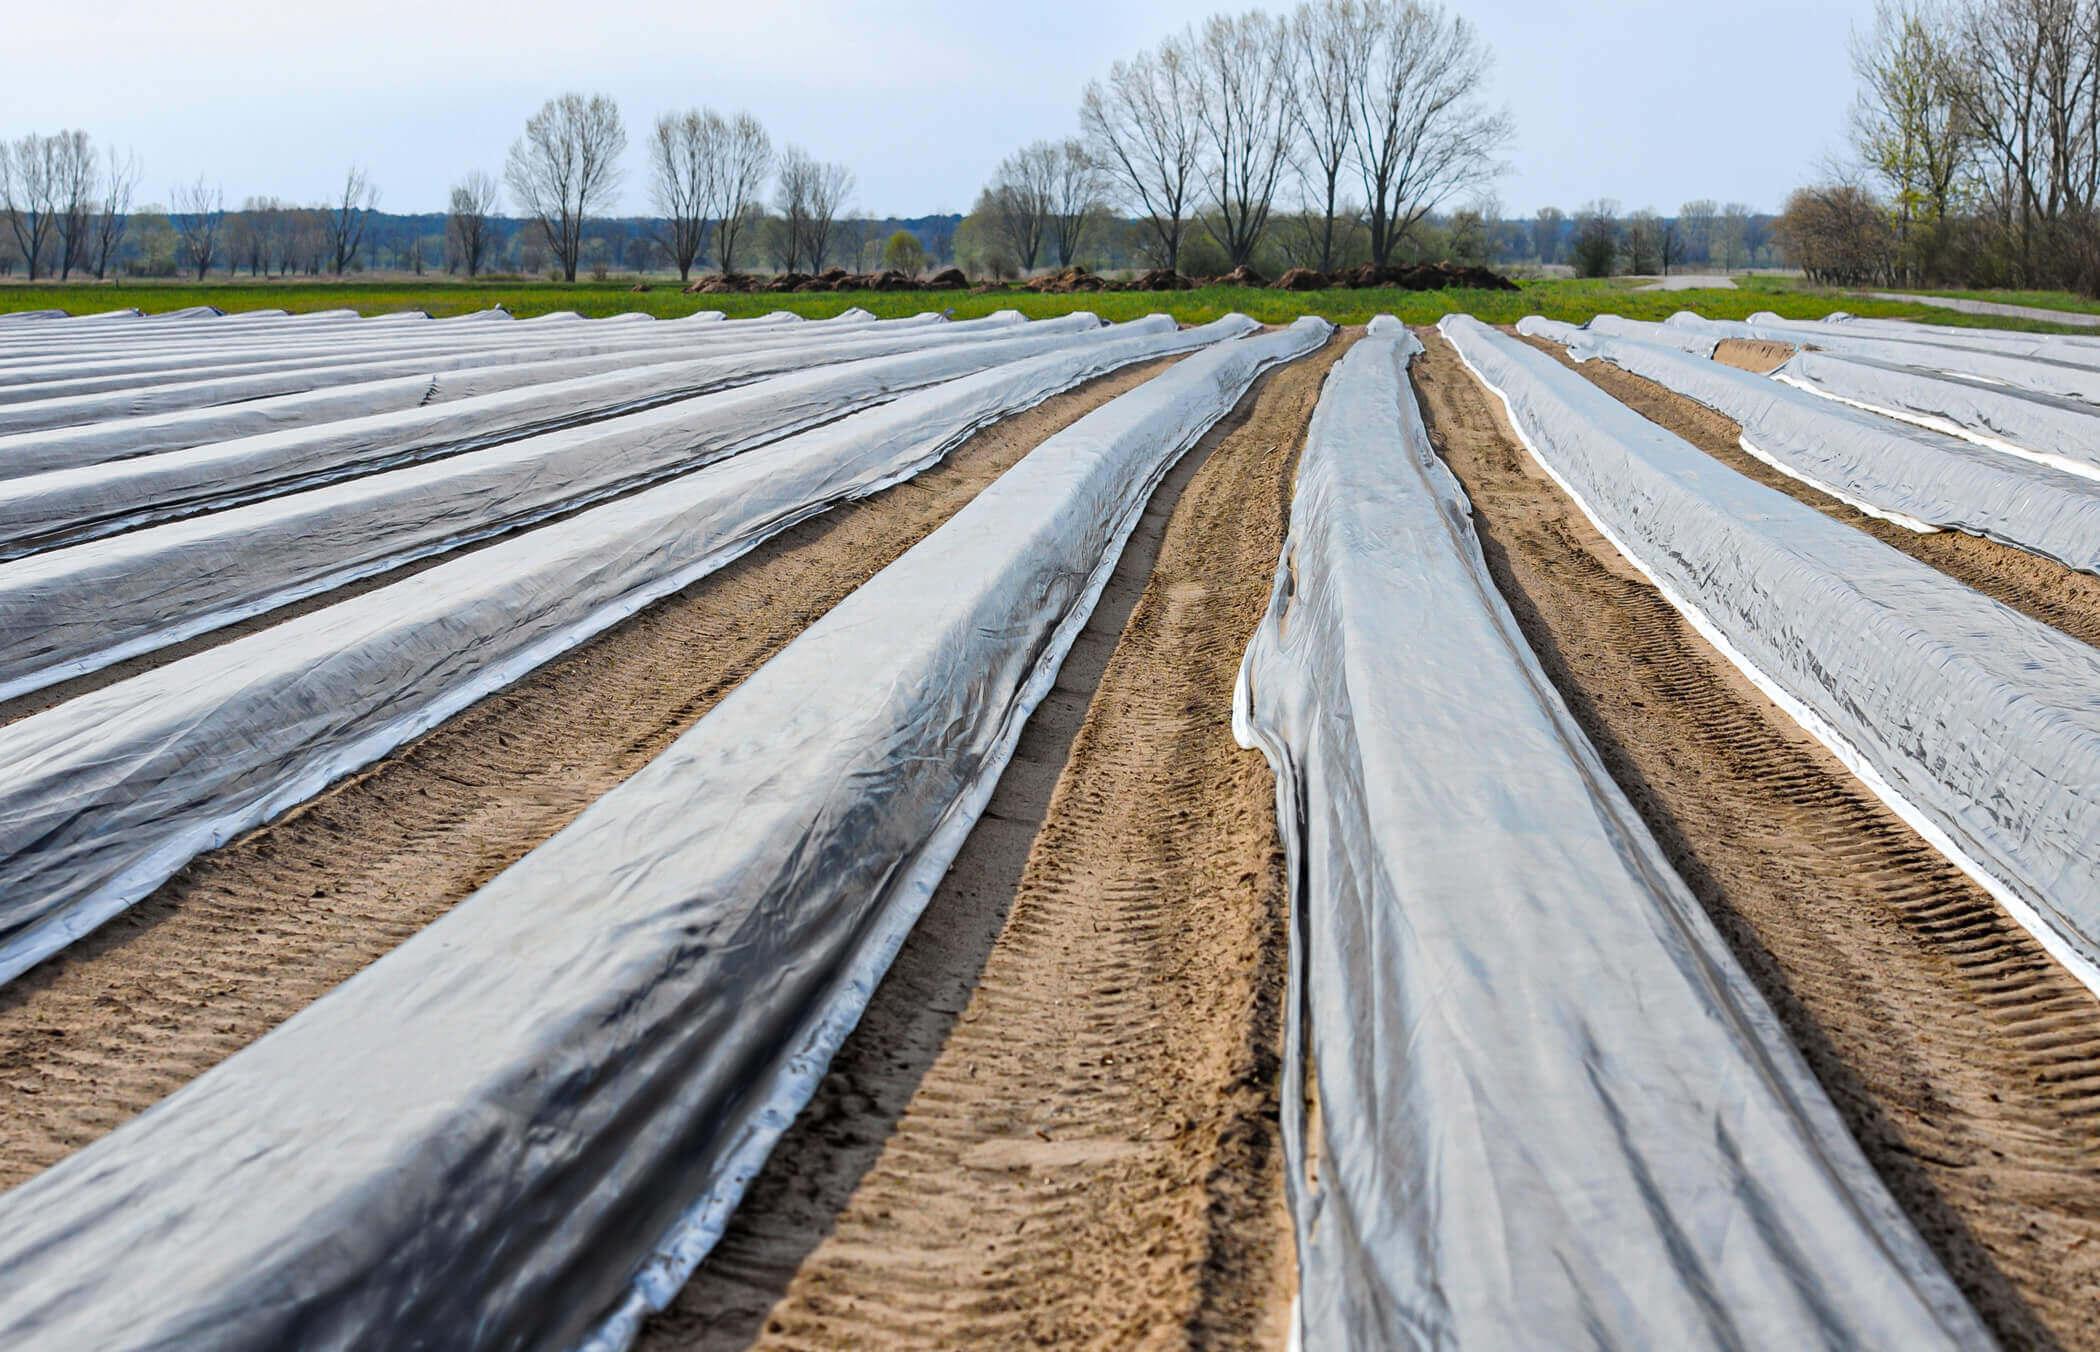 Spargelfolie Kunststoff auf dem Feld